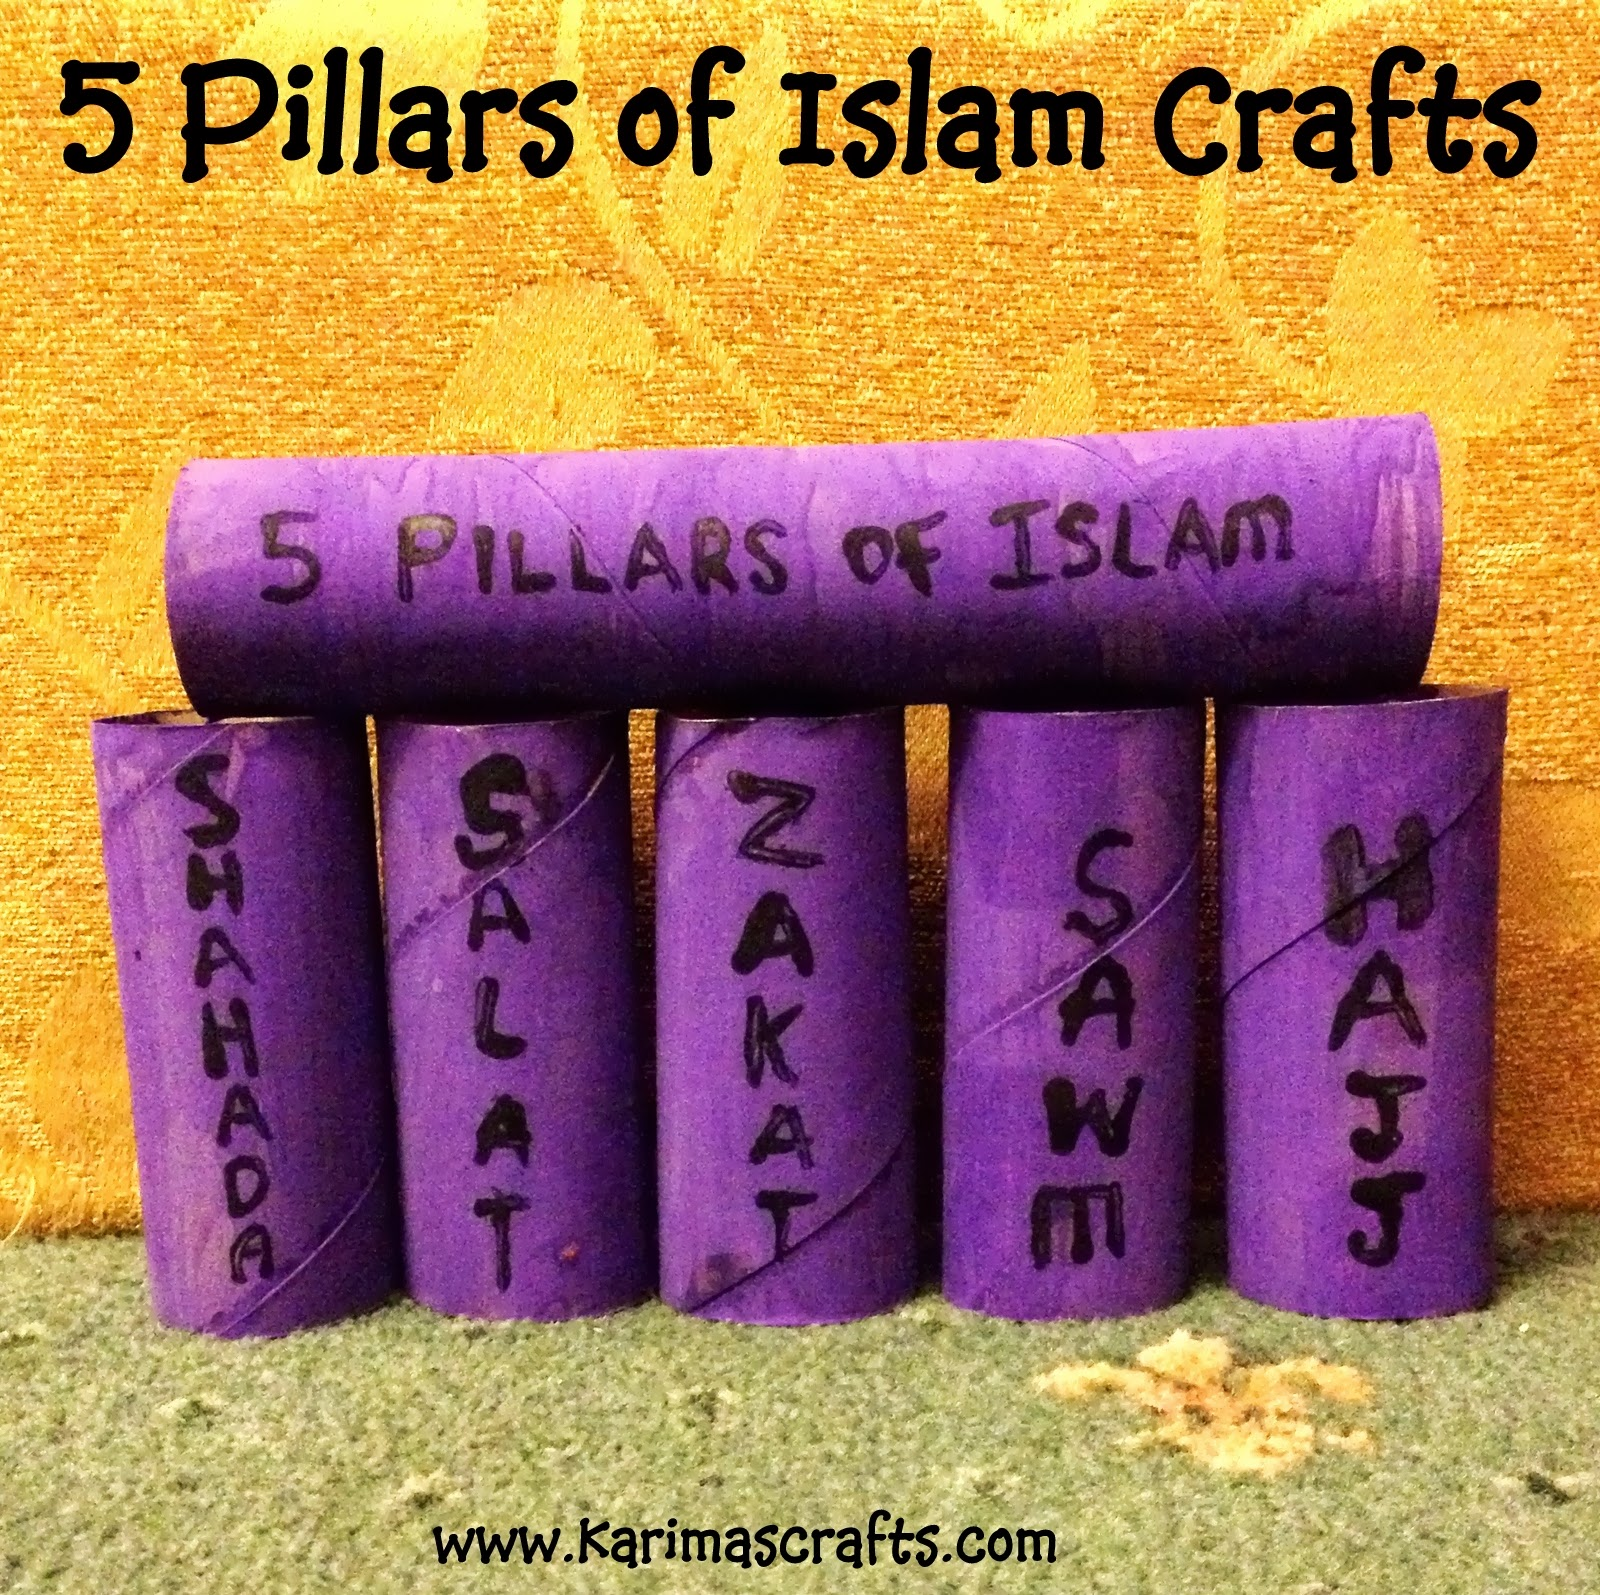 The 5 pillars of islam essay